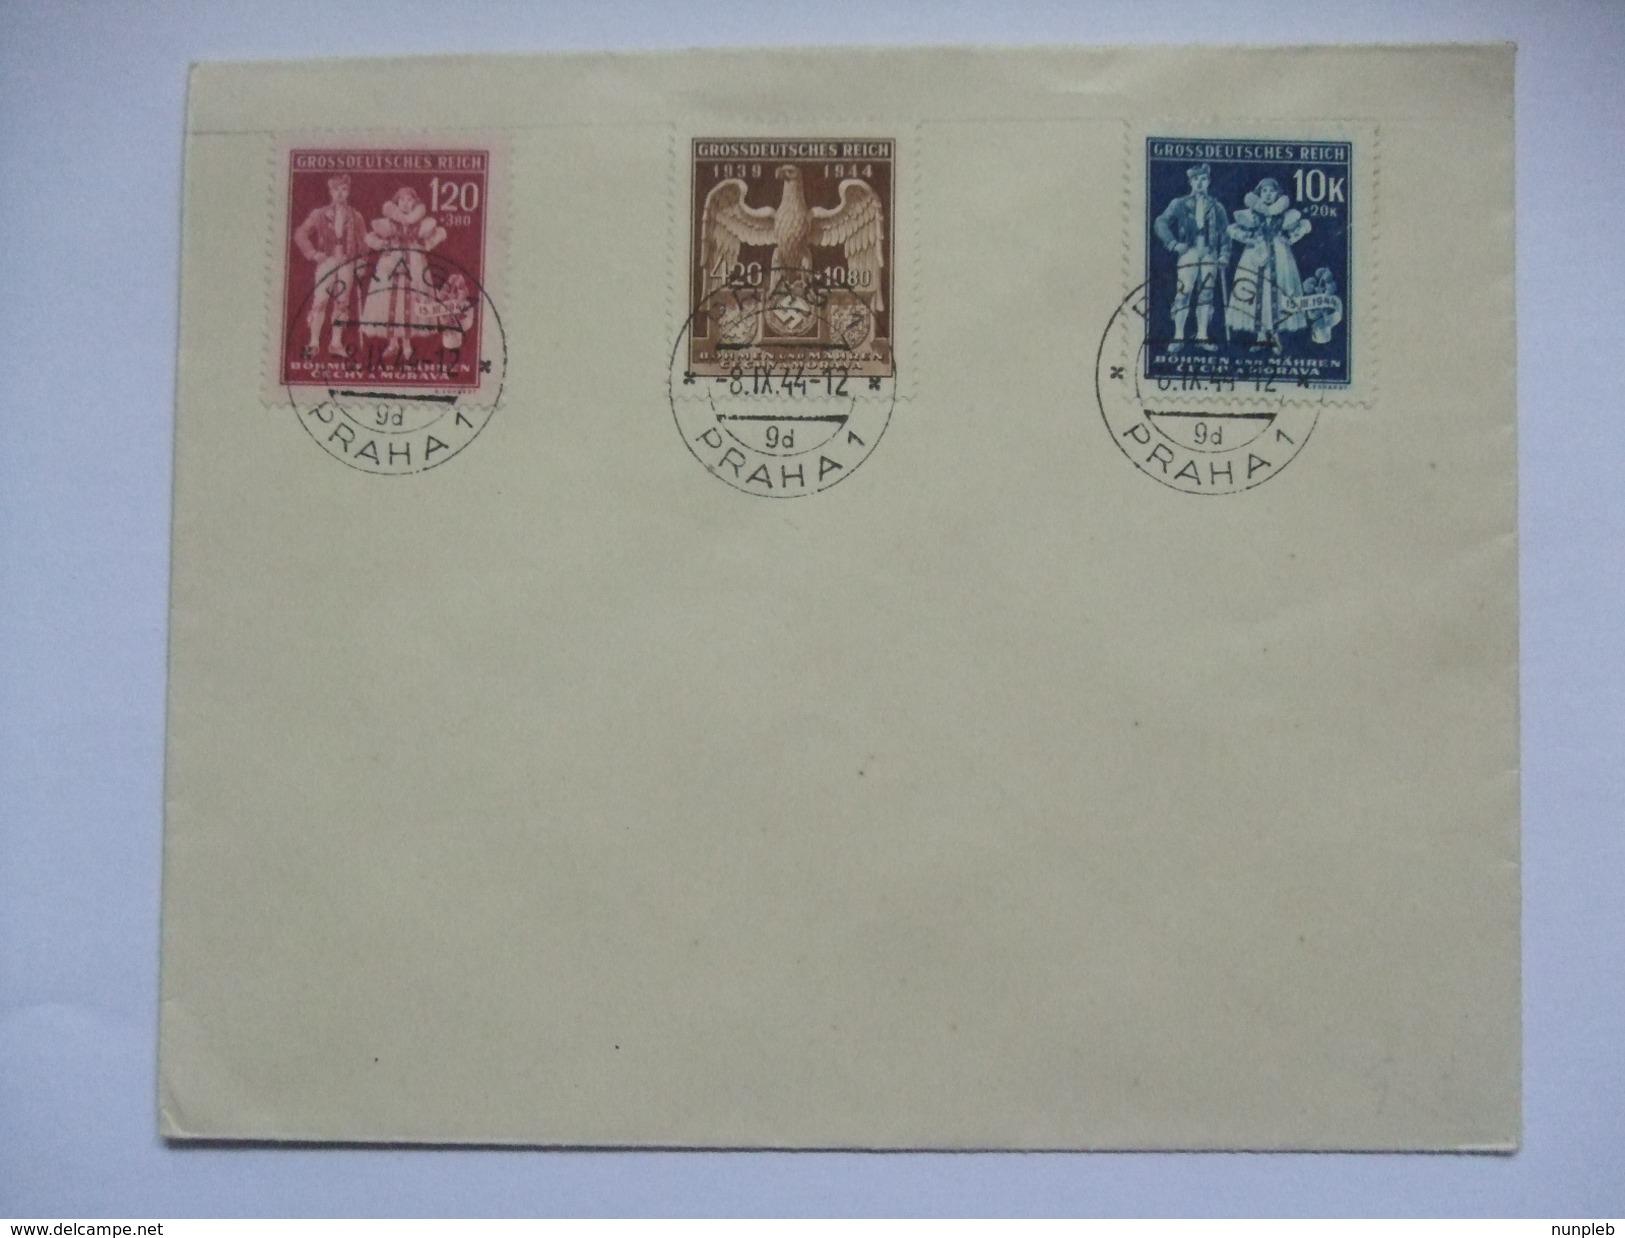 Bohemia & Moravia 1944 - Bohmen Und Mahren - Cover Tied With Mi 133-135 - Praha Postmark - Bohemia & Moravia